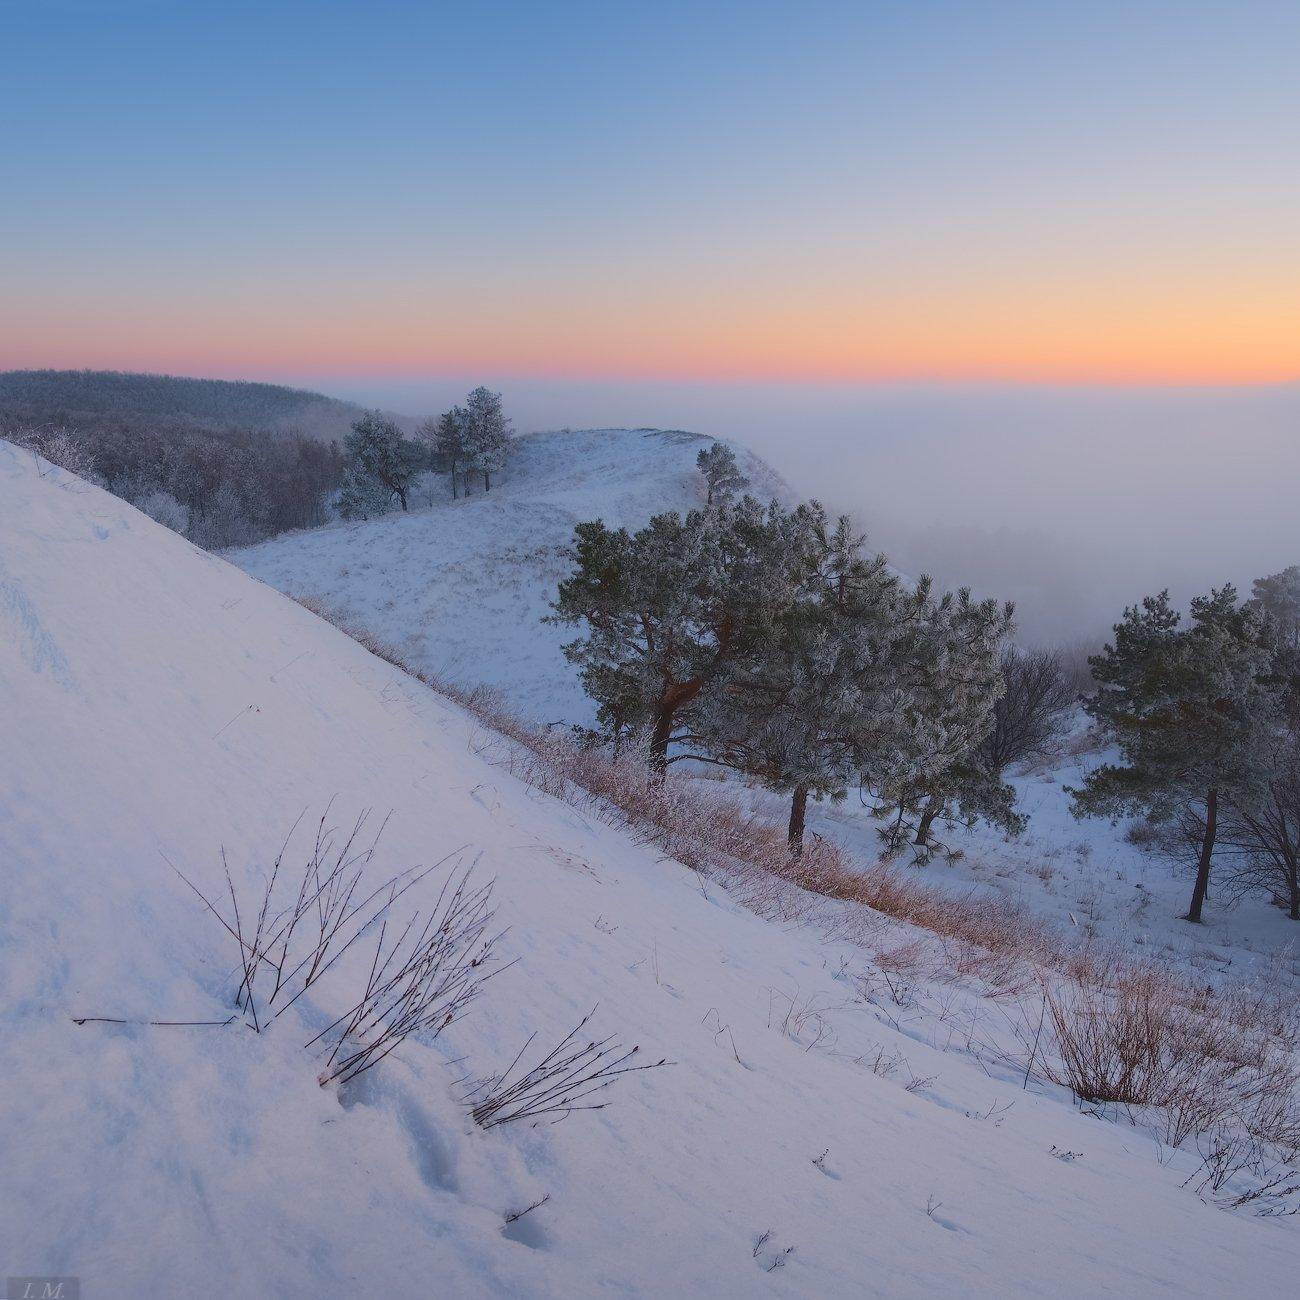 evening, fog, Landscape, light, nature, snow, sunset, Ukraine, white, winter, вечер, закат, зима, мороз, пейзаж, природа, свет, снег, сосны, сумерки, туман, Украина, холмы, hills, trees, colors, twilight, I'M